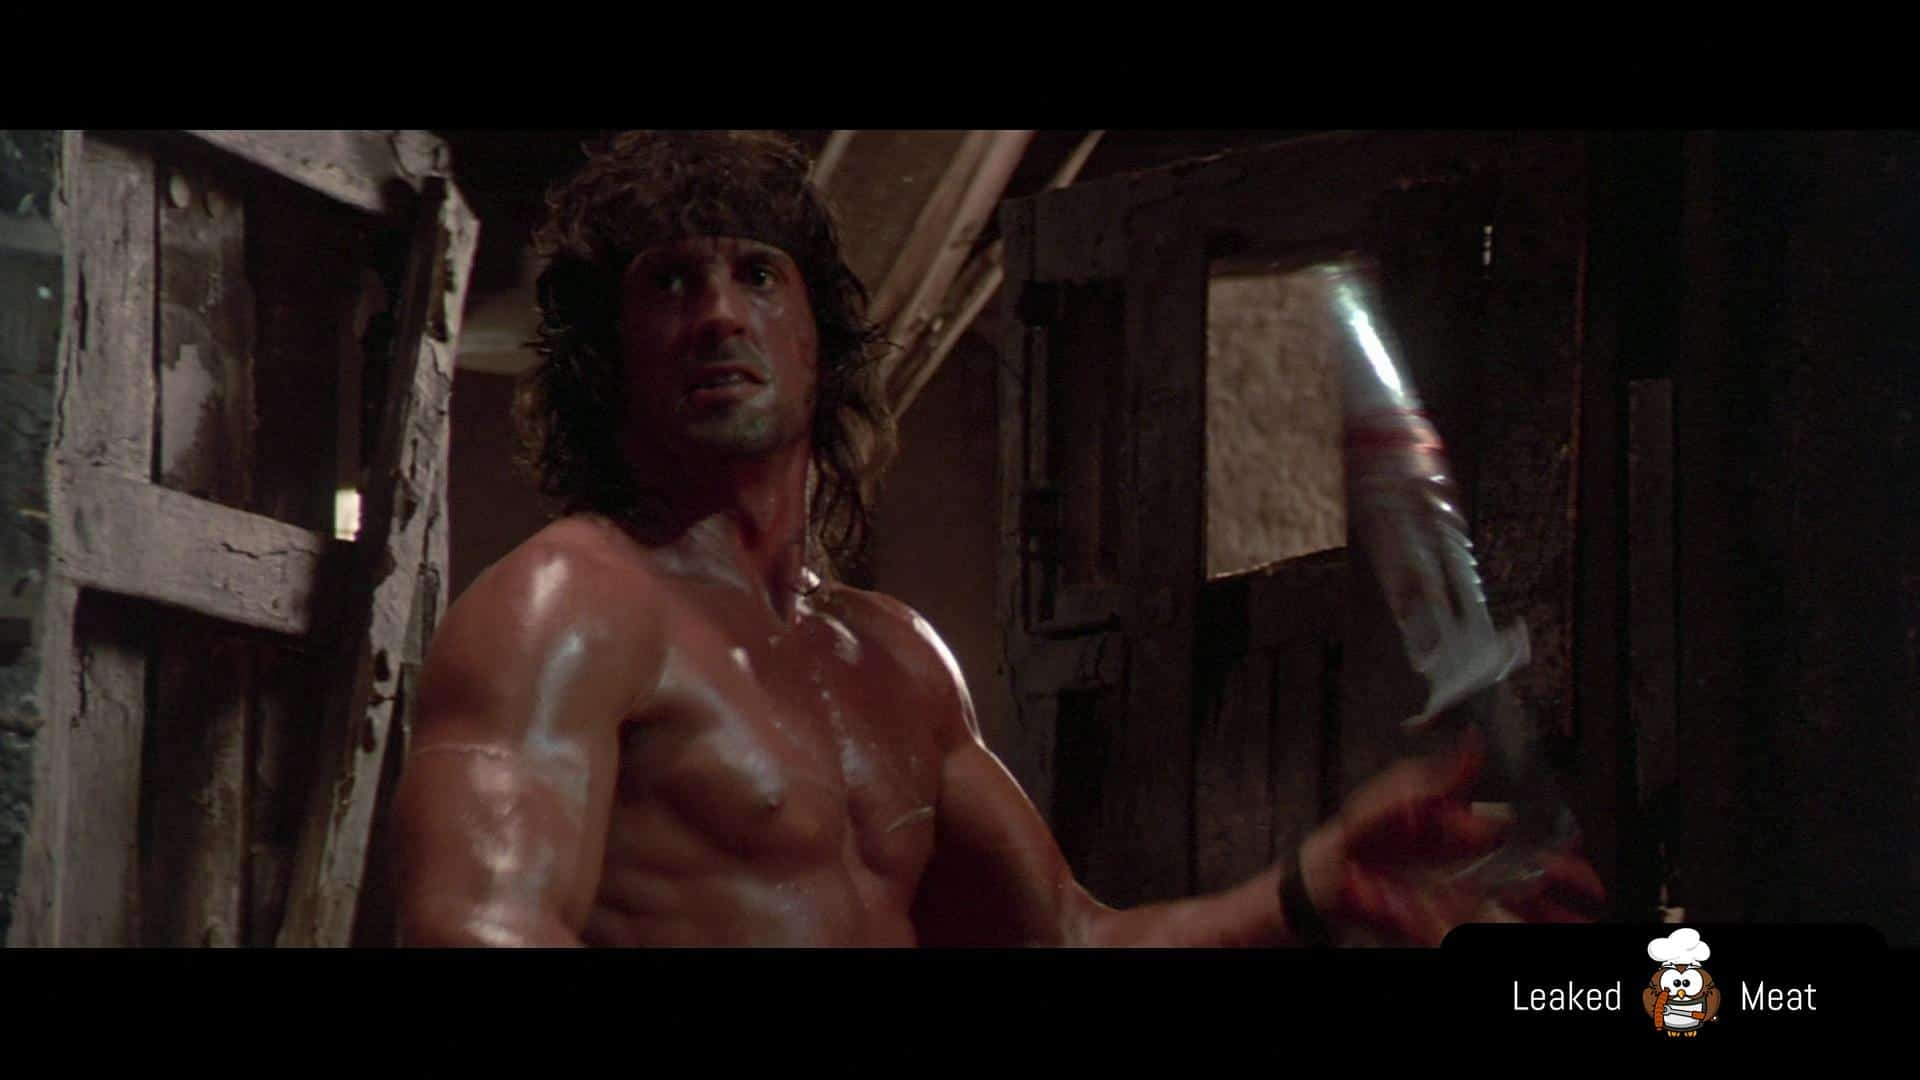 Sylvester Stallone | LeakedMeat 51